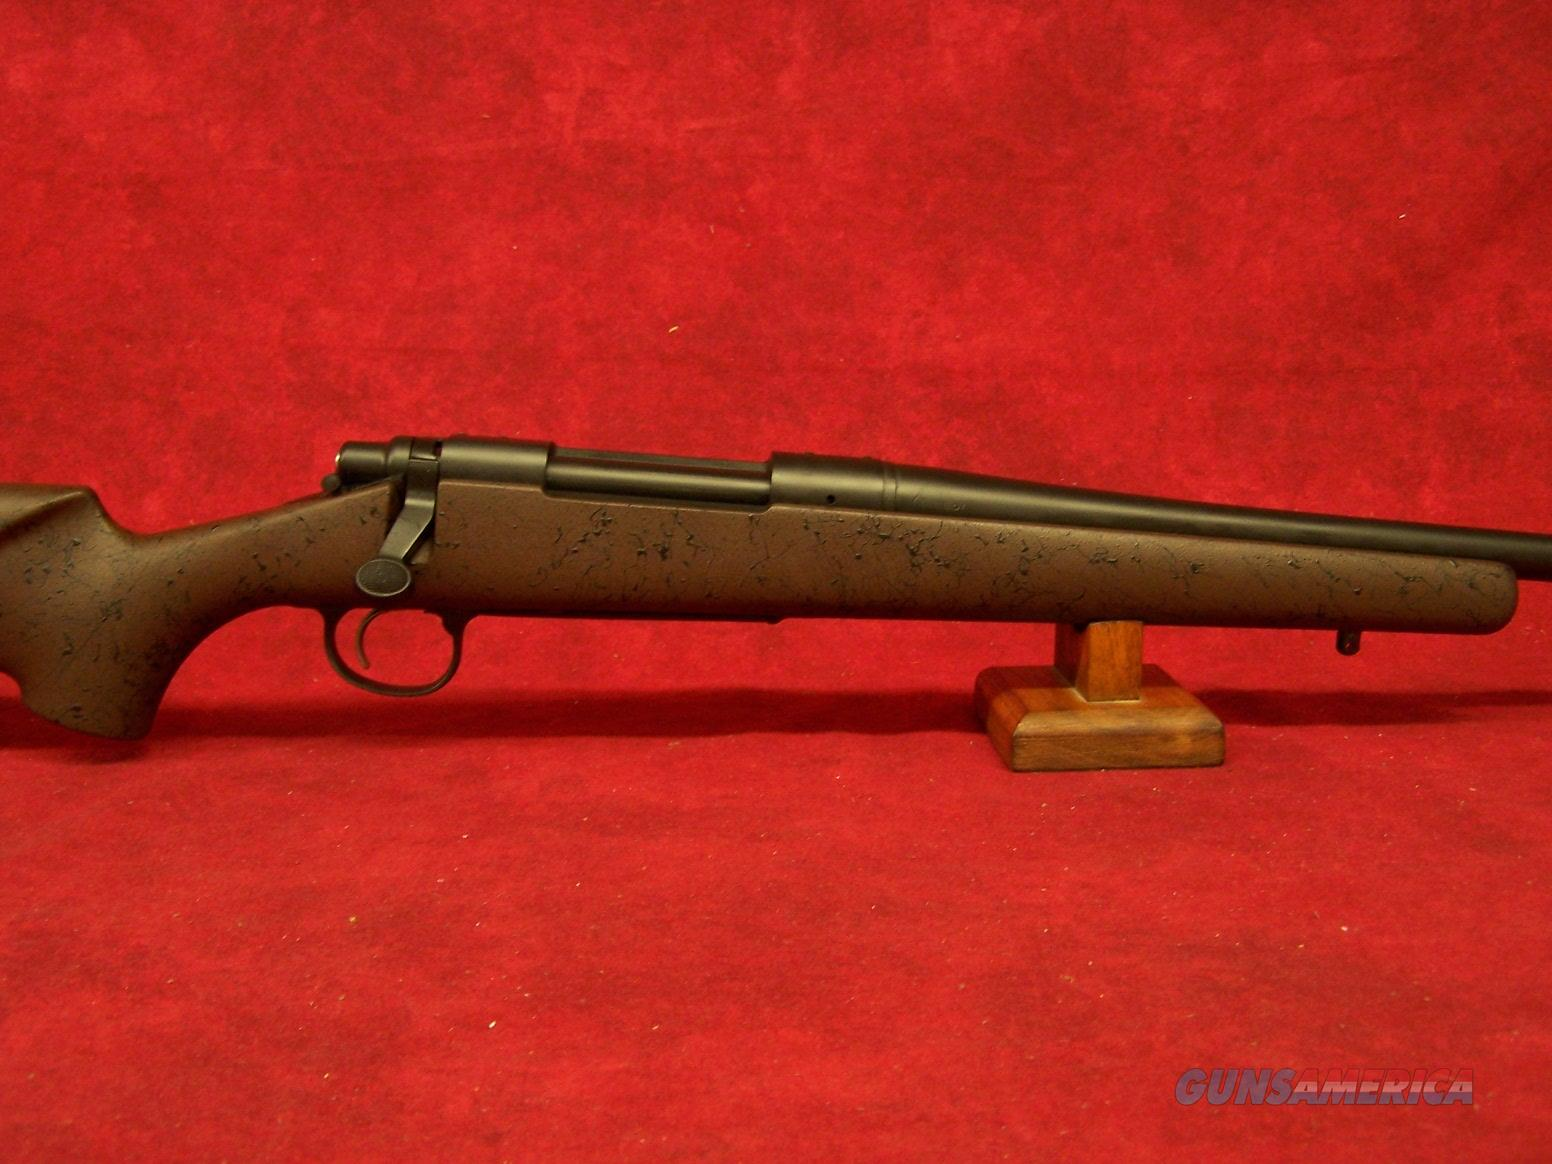 "Remington 700 American Wilderness Rifle .300 WinMag 24"" Barrel Black Cerakote Finish Grayboe Stock (84555)  Guns > Rifles > Remington Rifles - Modern > Model 700 > Sporting"